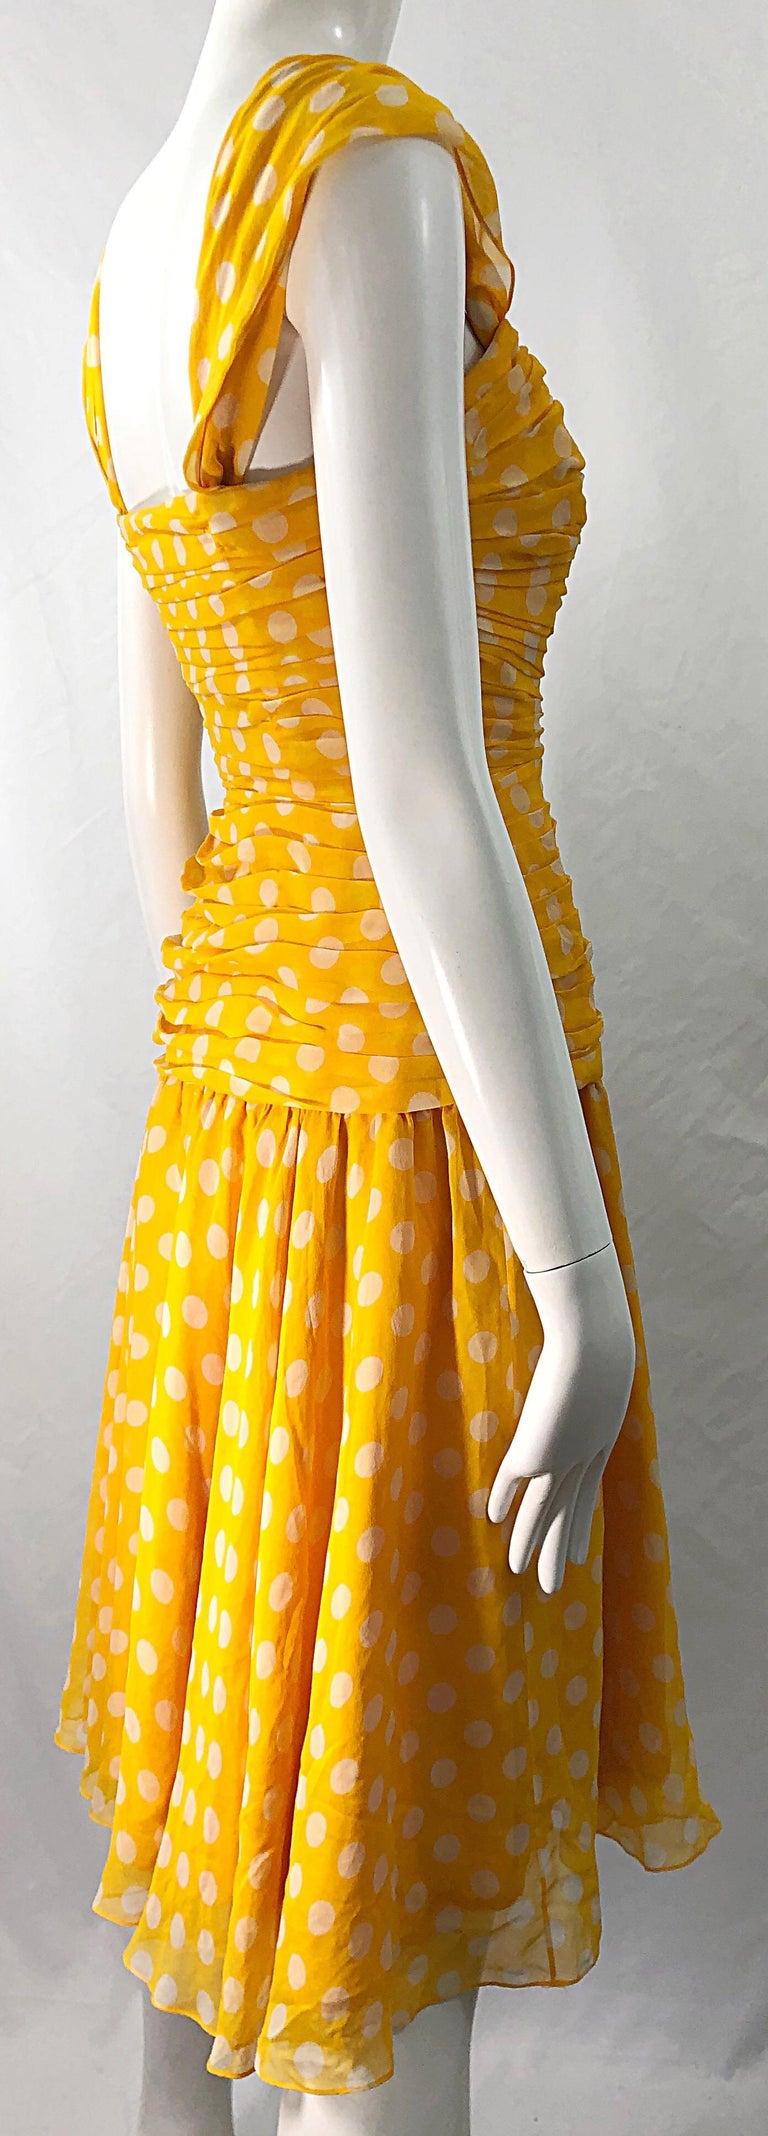 Adele Simpson 1980s Size 4 Yellow White Silk Chiffon Polka Dot Vintage 80s Dress For Sale 7